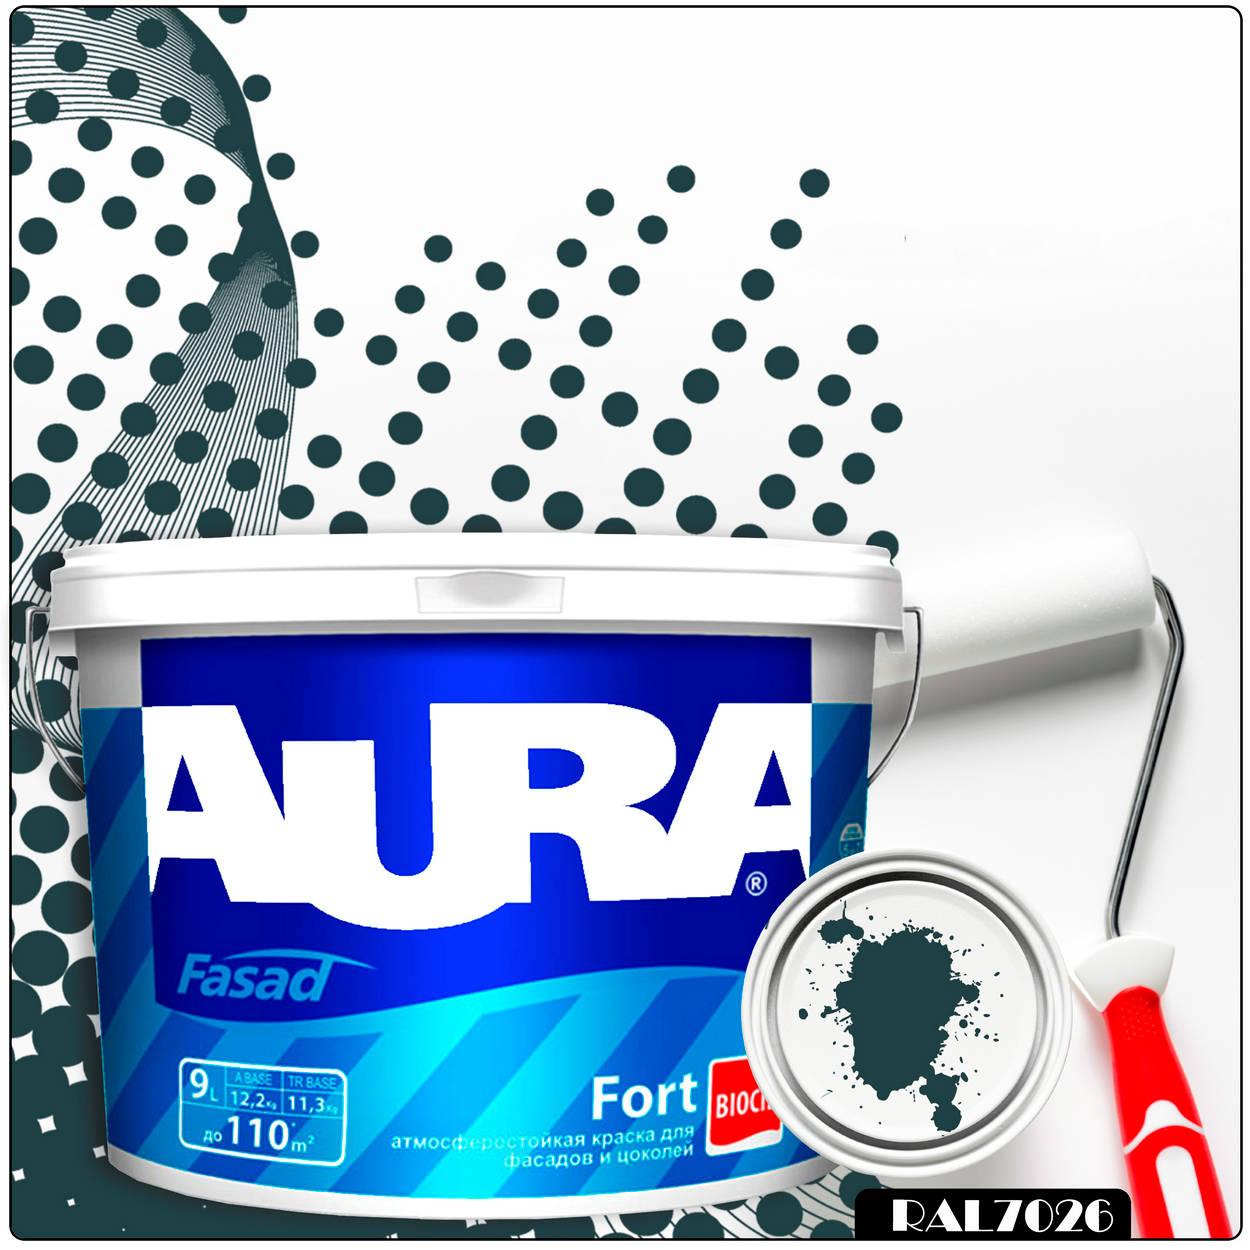 Фото 19 - Краска Aura Fasad Fort, RAL 7026 Серый гранит, латексная, матовая, для фасада и цоколей, 9л, Аура.